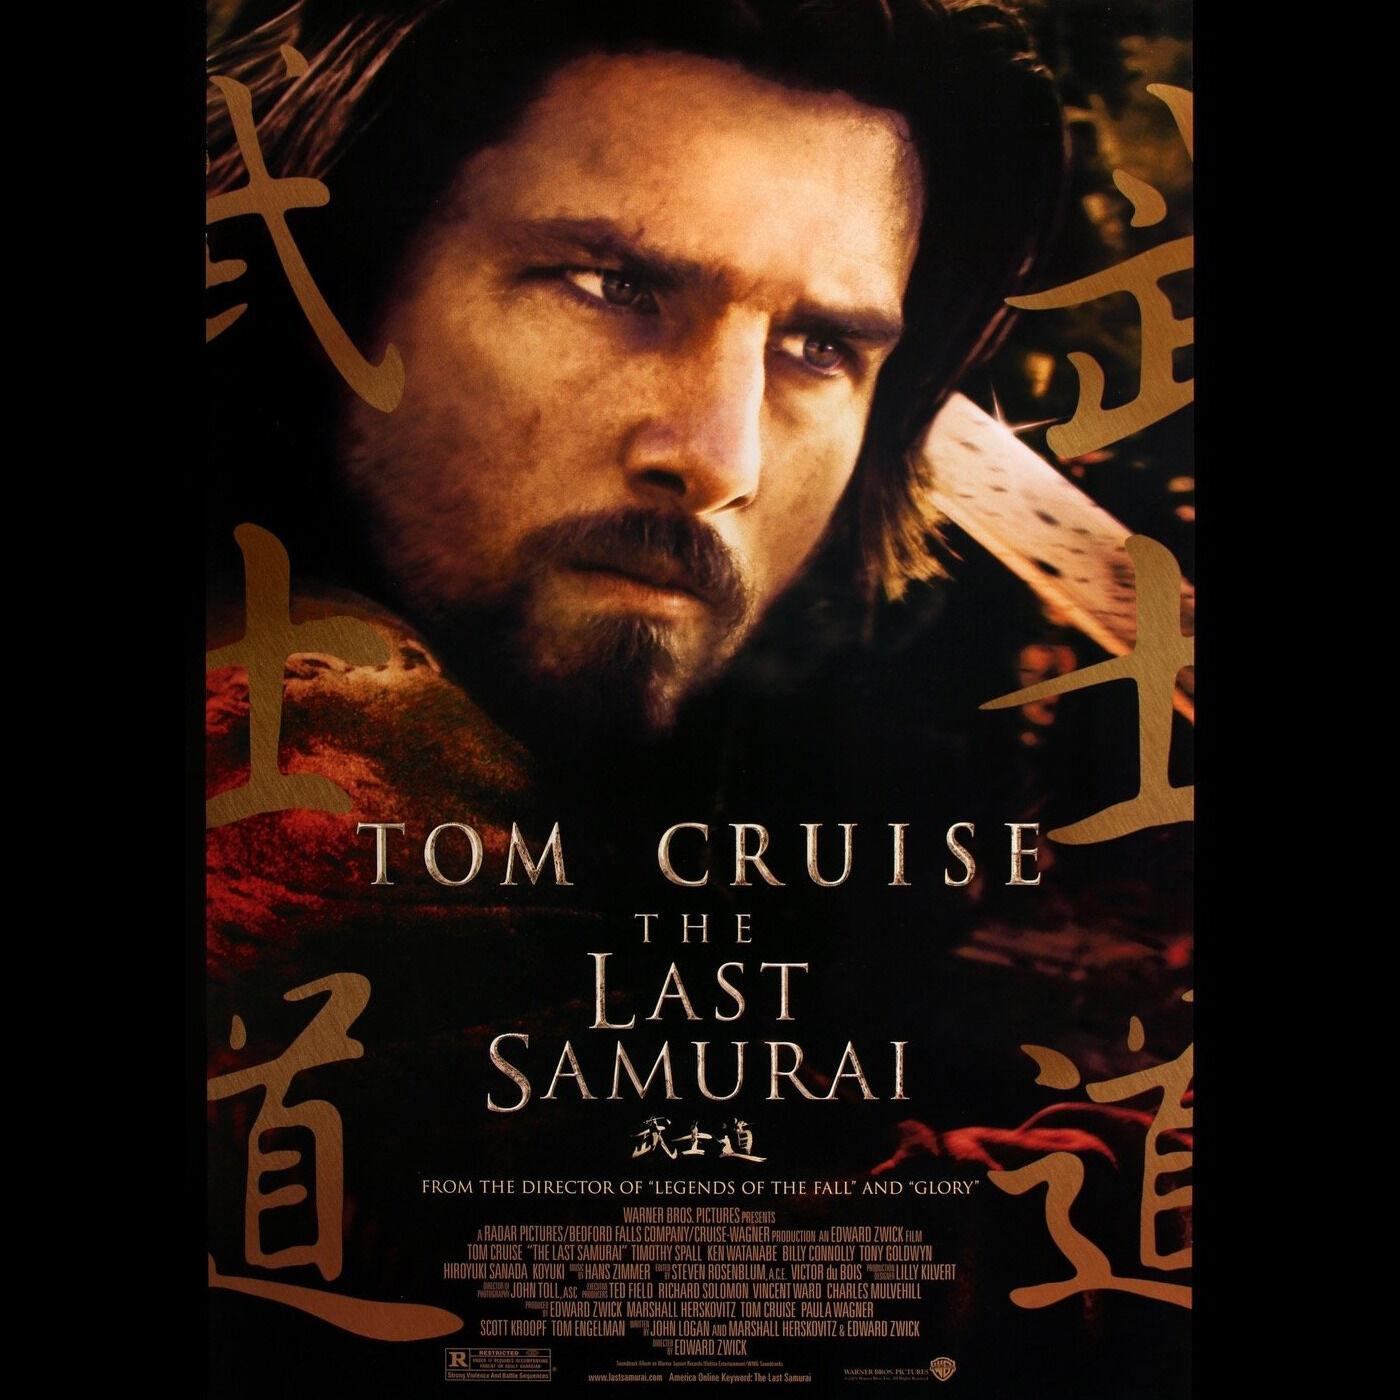 Episode 20: The Last Samurai (Barry's Quarantine List Pick #4)